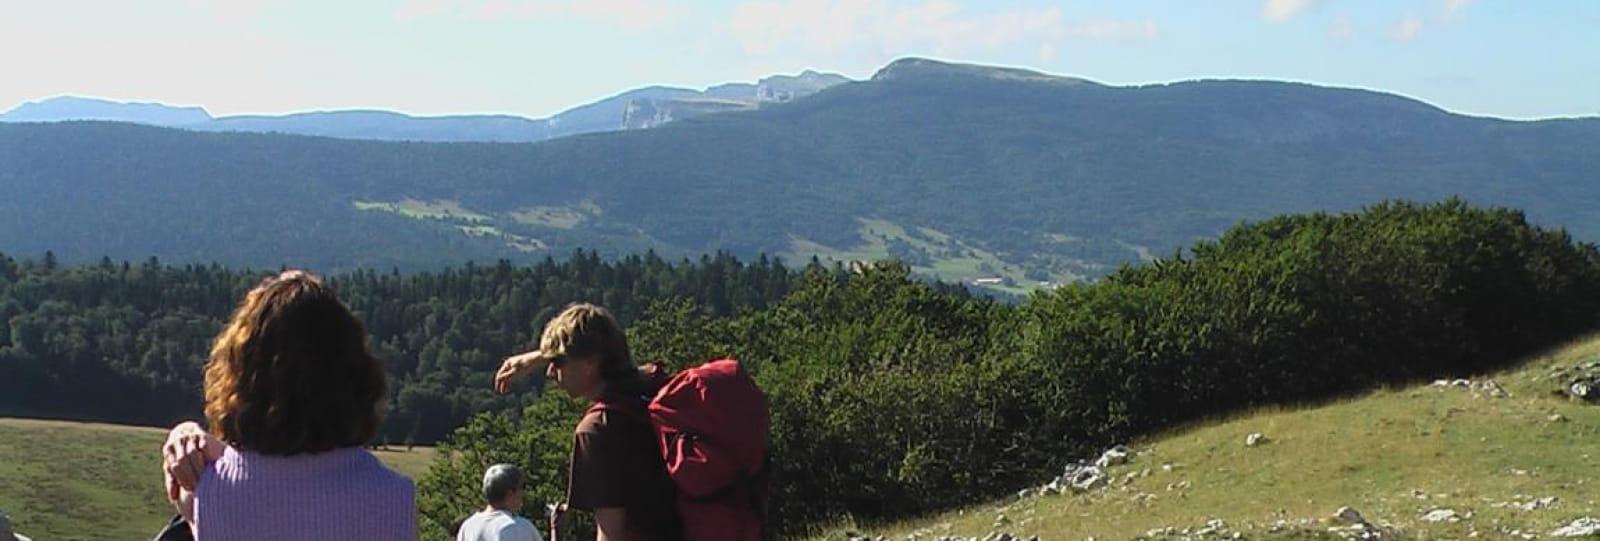 Rando - Hauts plateaux